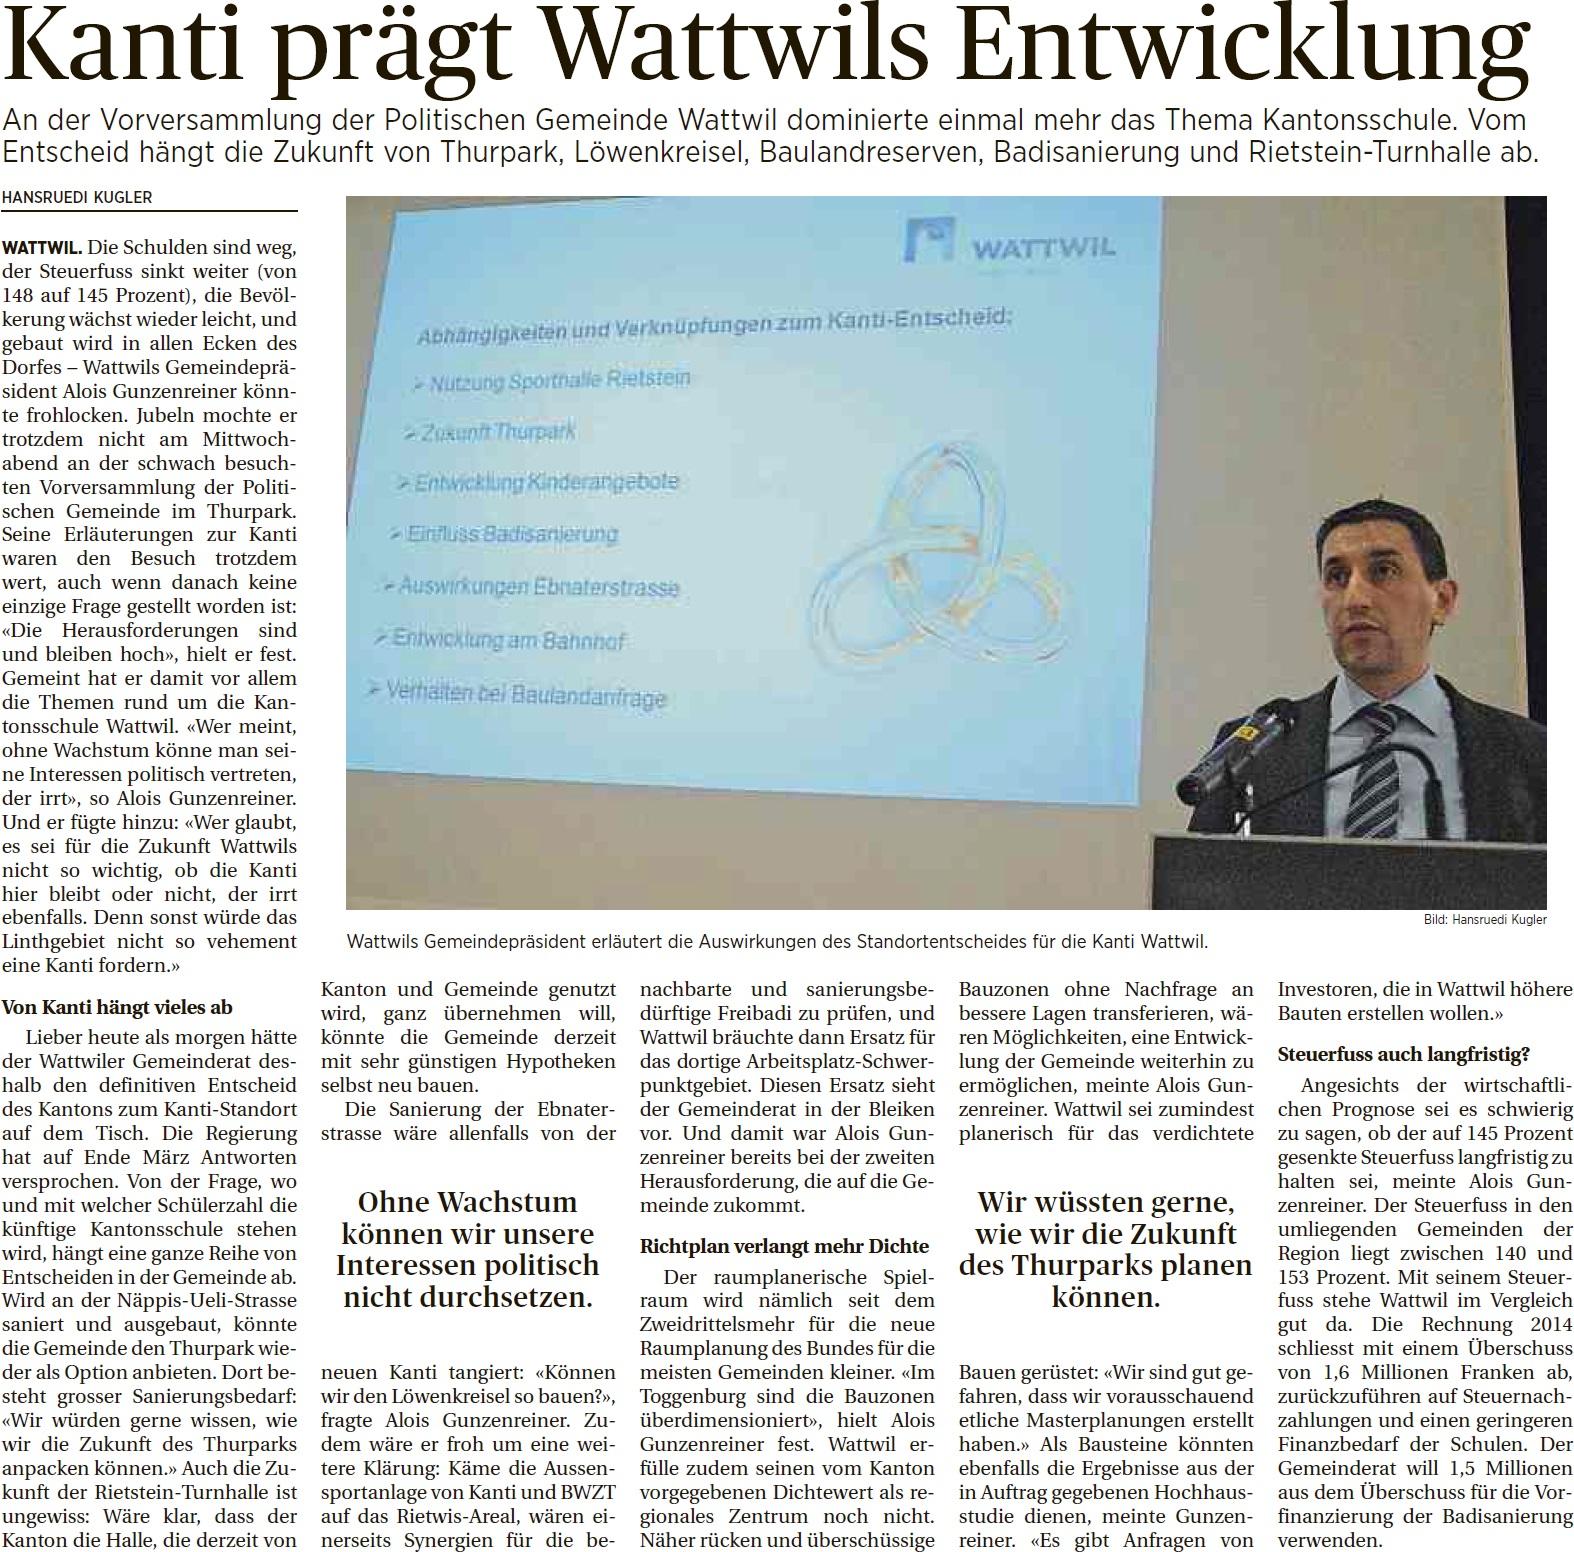 Kanti prägt Wattwils Entwicklung (Freitag, 13.03.2015)